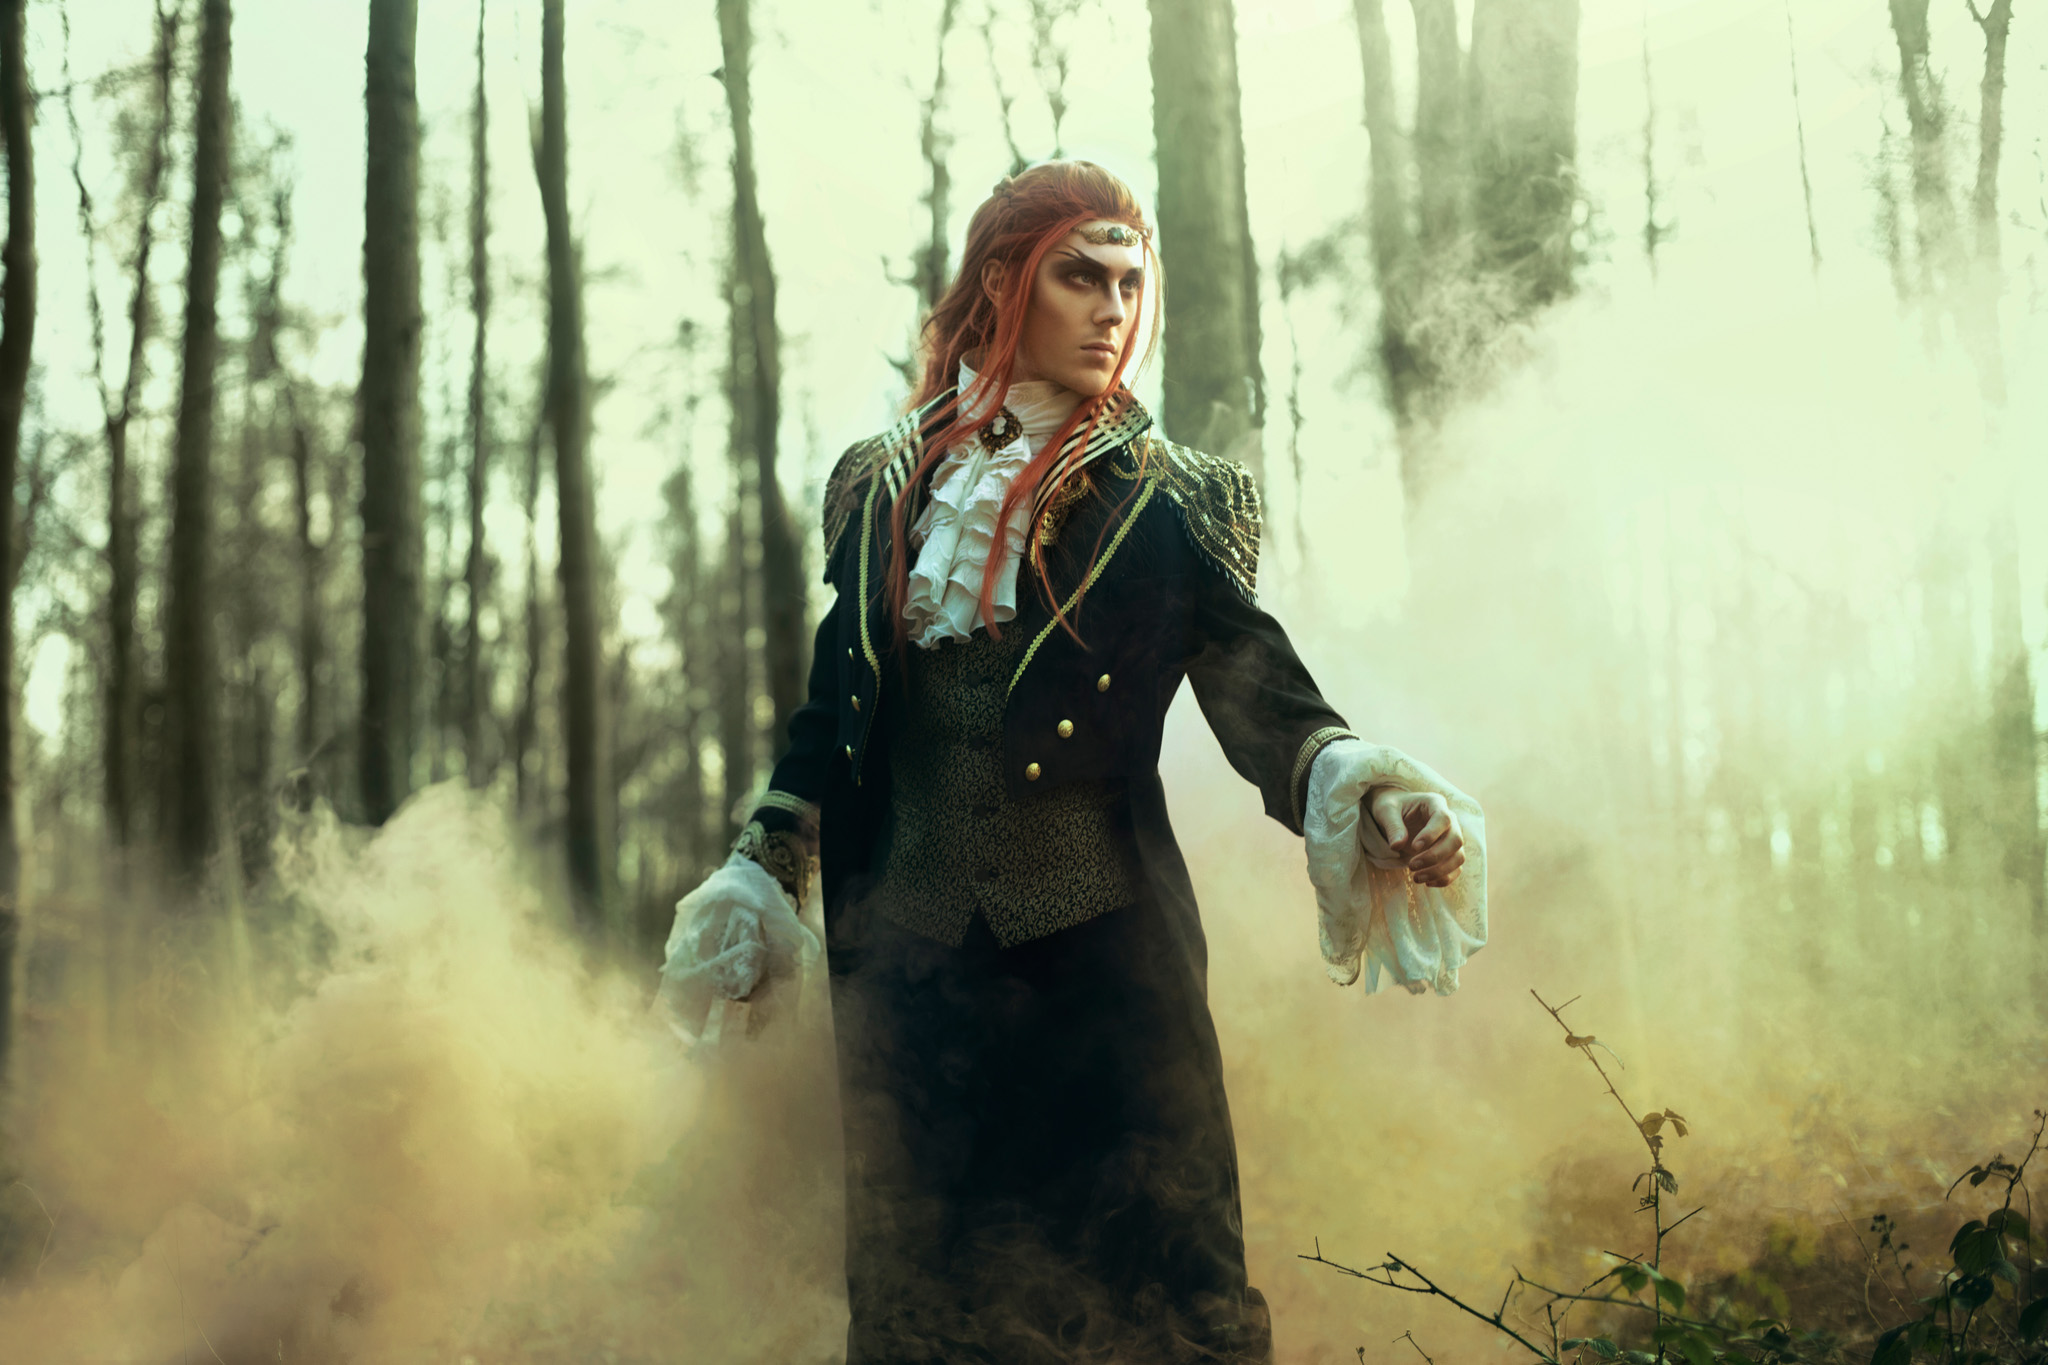 bella-kotak-fairytale-fairytales-labyrinth-david-bowie-sarah-beauty-beast-magic-magical-faerie-magazine-editorial-firefly-path-twilight-woods-lantern-ethereal-fairy-disney-ian-hencher-6s.jpg